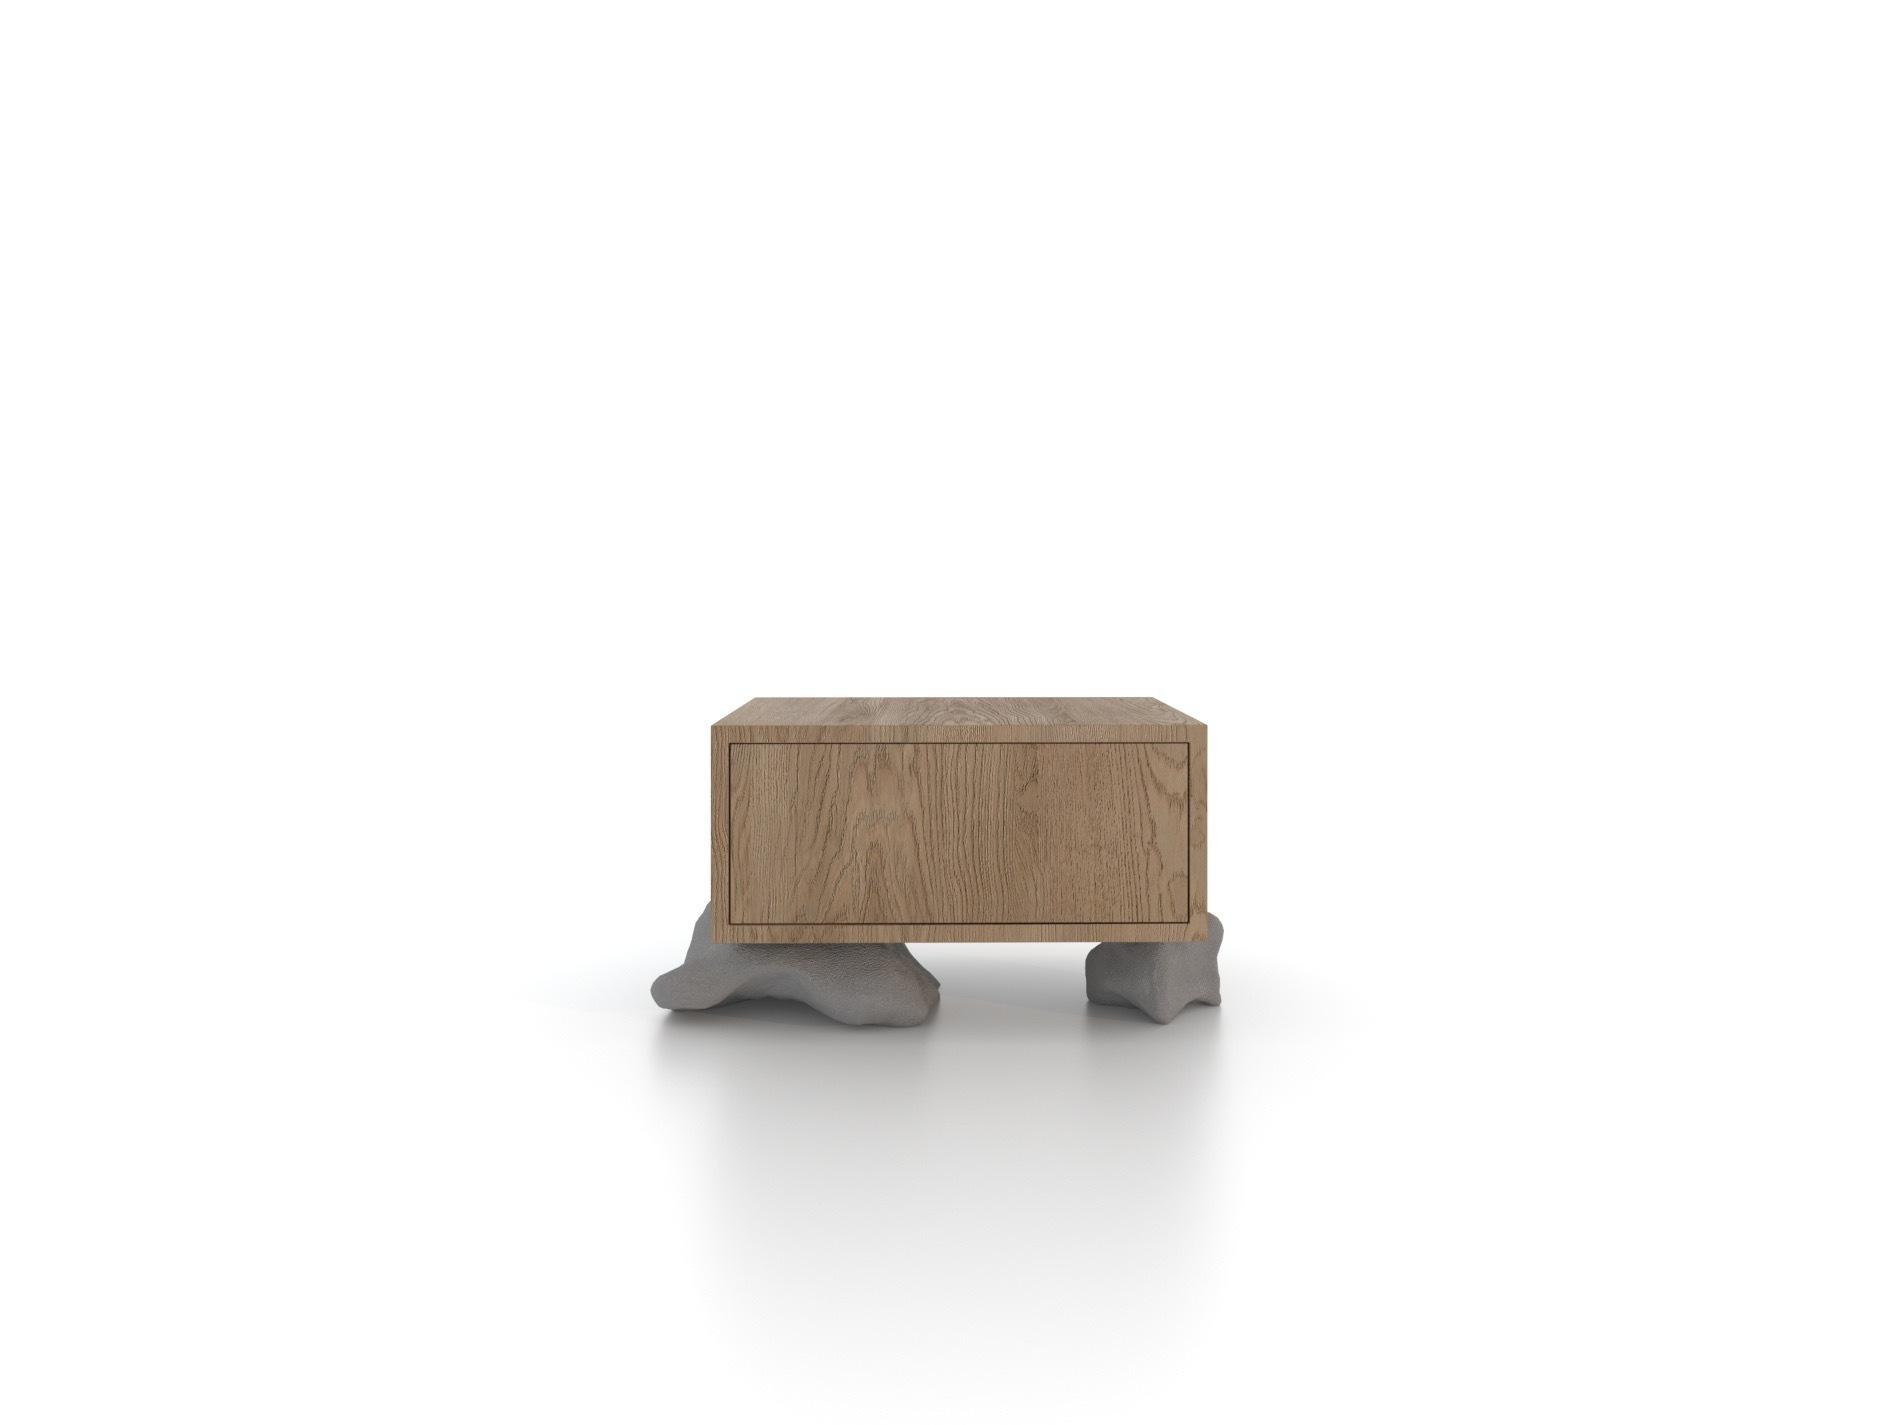 Тумба прикроватная на камнях XL